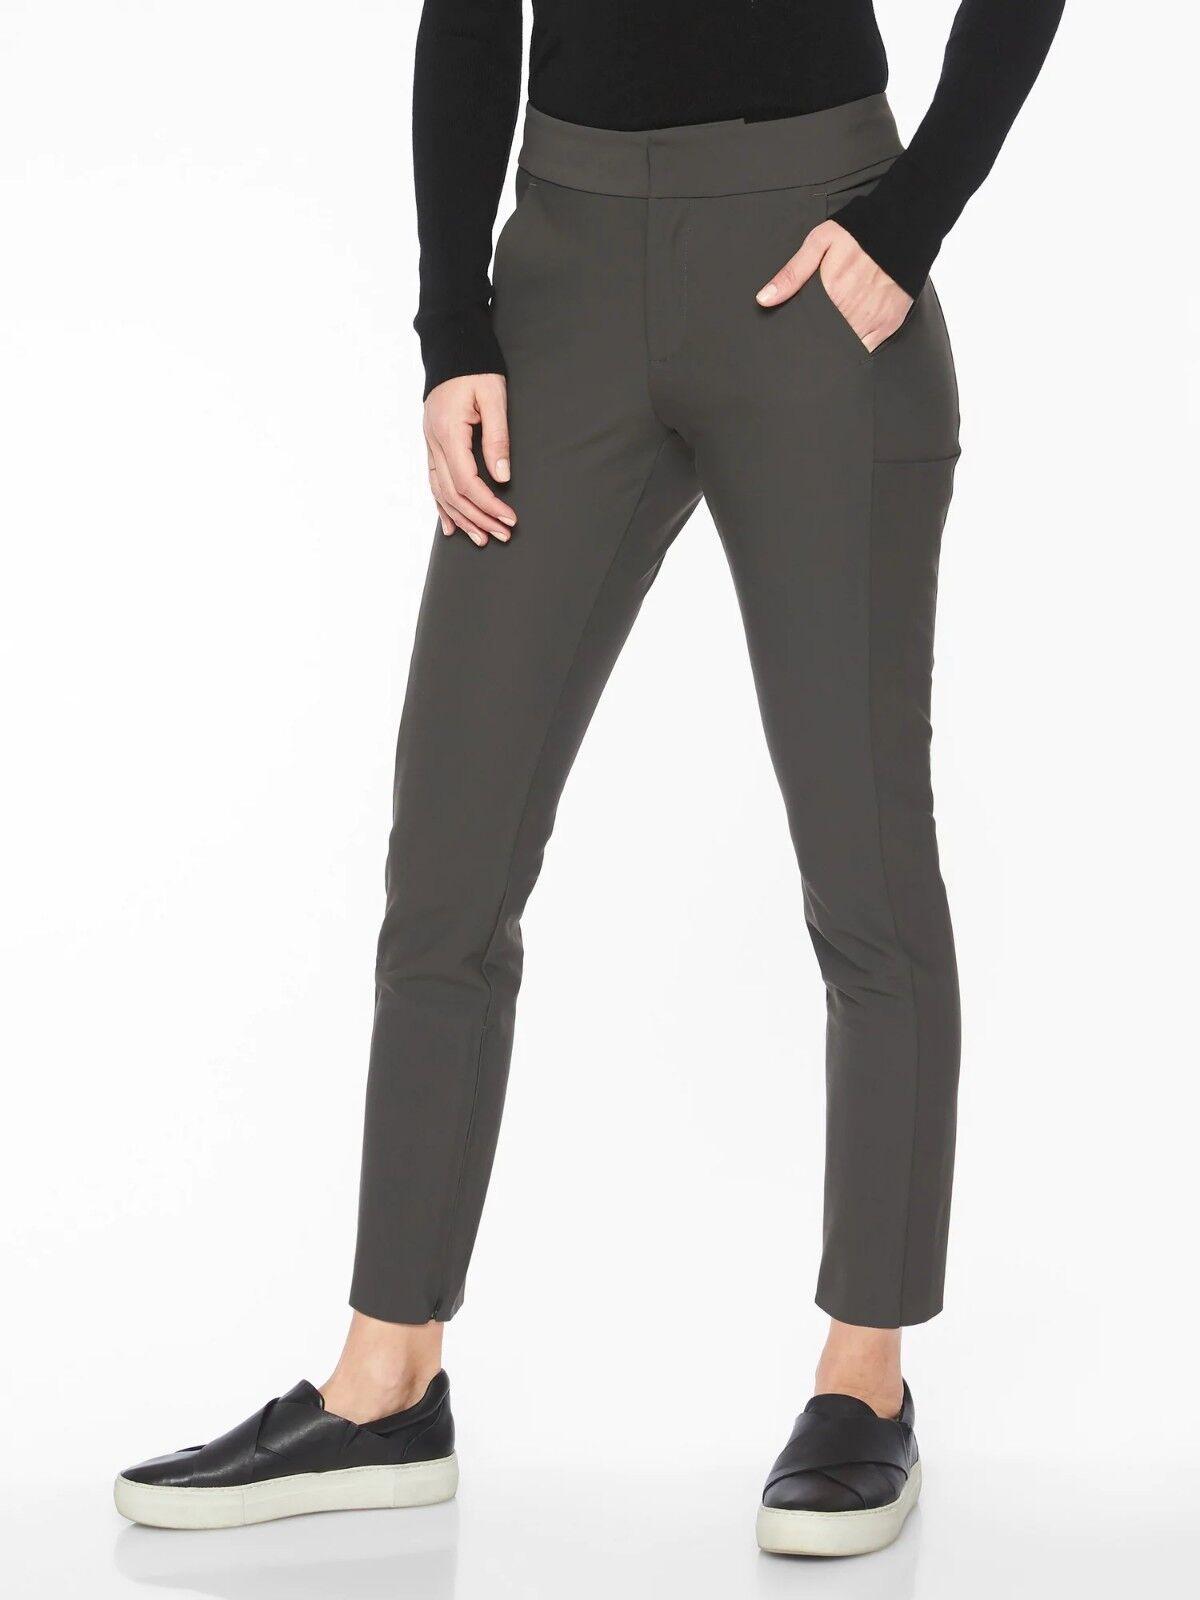 NWT Athleta Stellar Trouser, Arbor Olive SIZE 8P  8 P      E1211